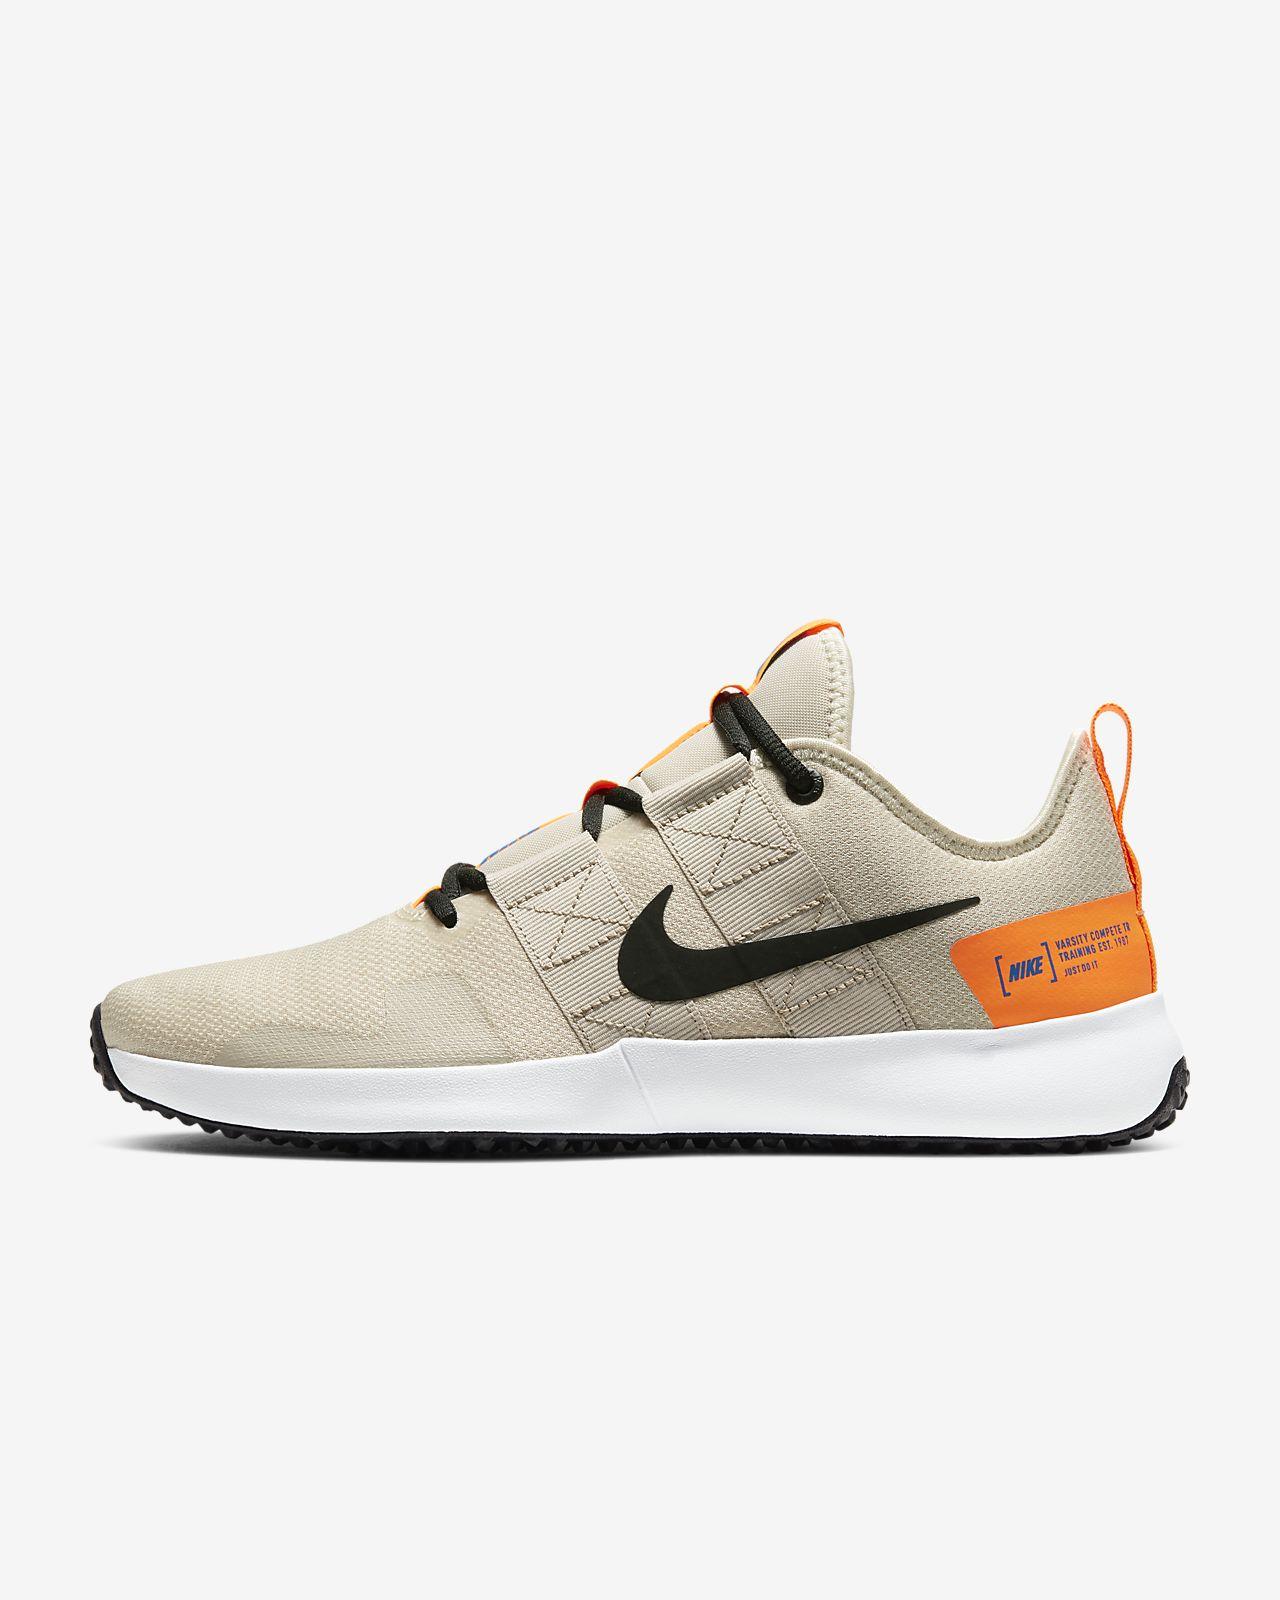 nike street shoes light training shoes